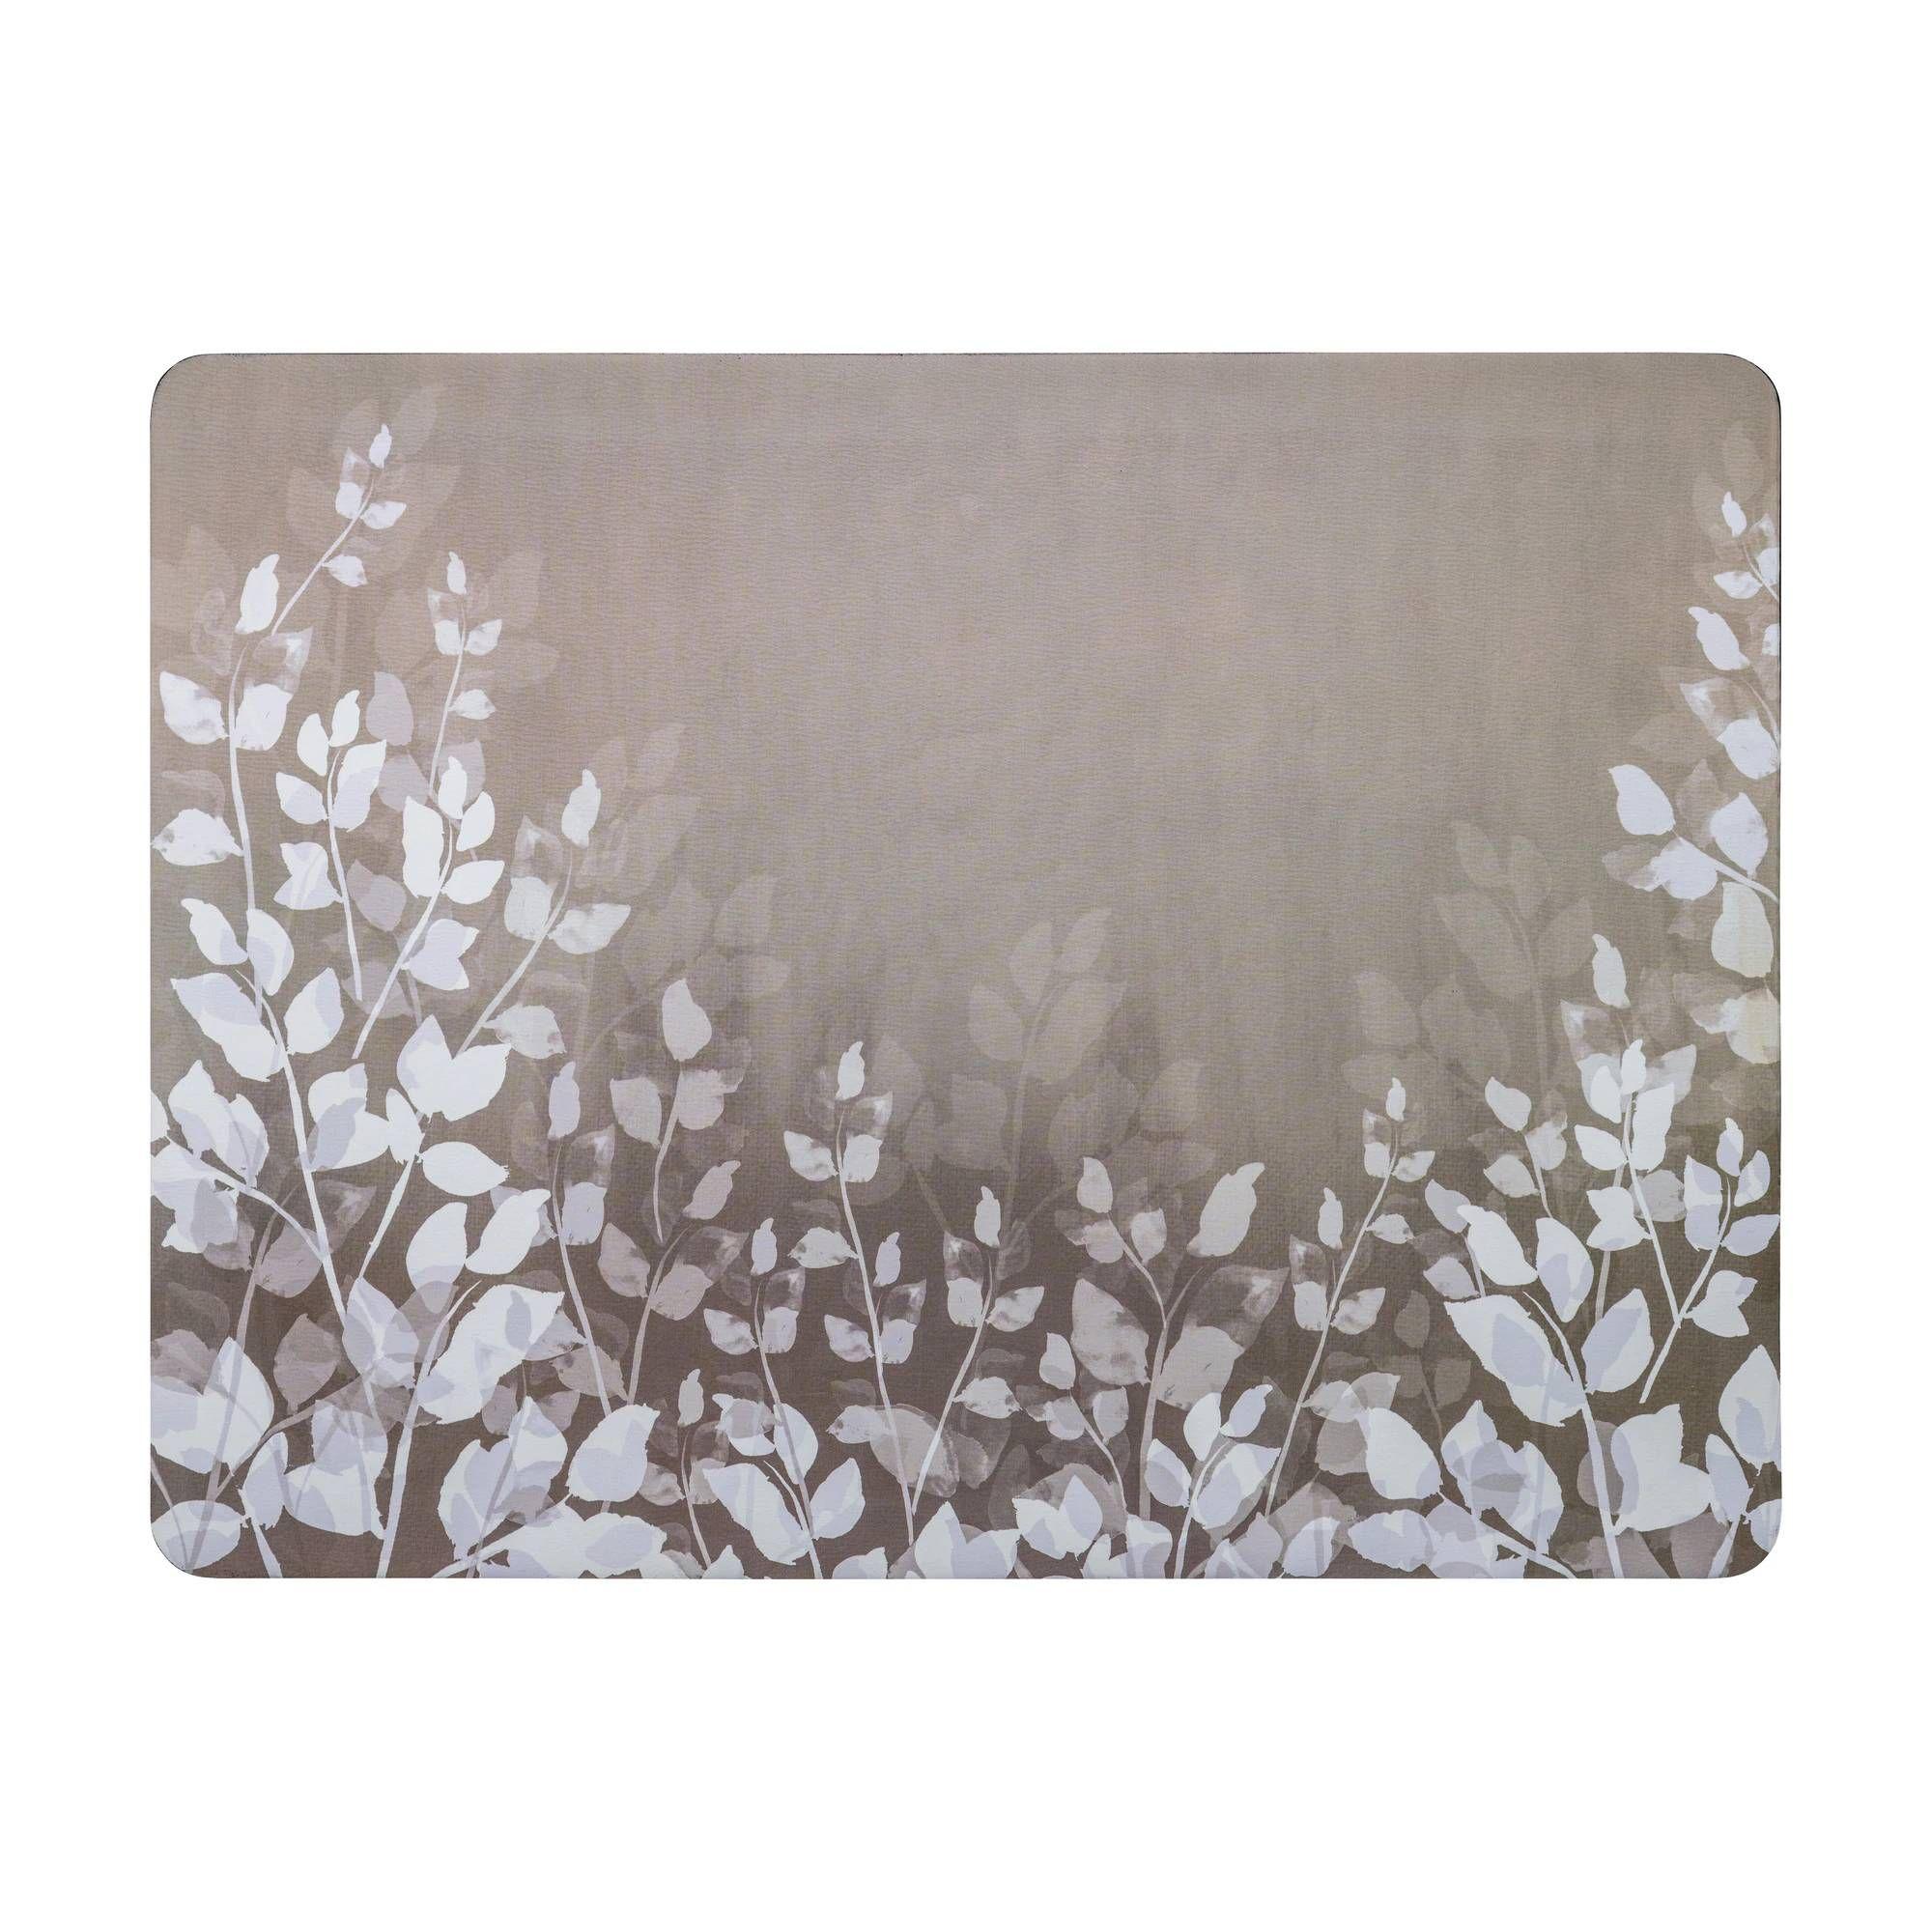 Denby Colours Set of 6 Placemats - Natural Foliage